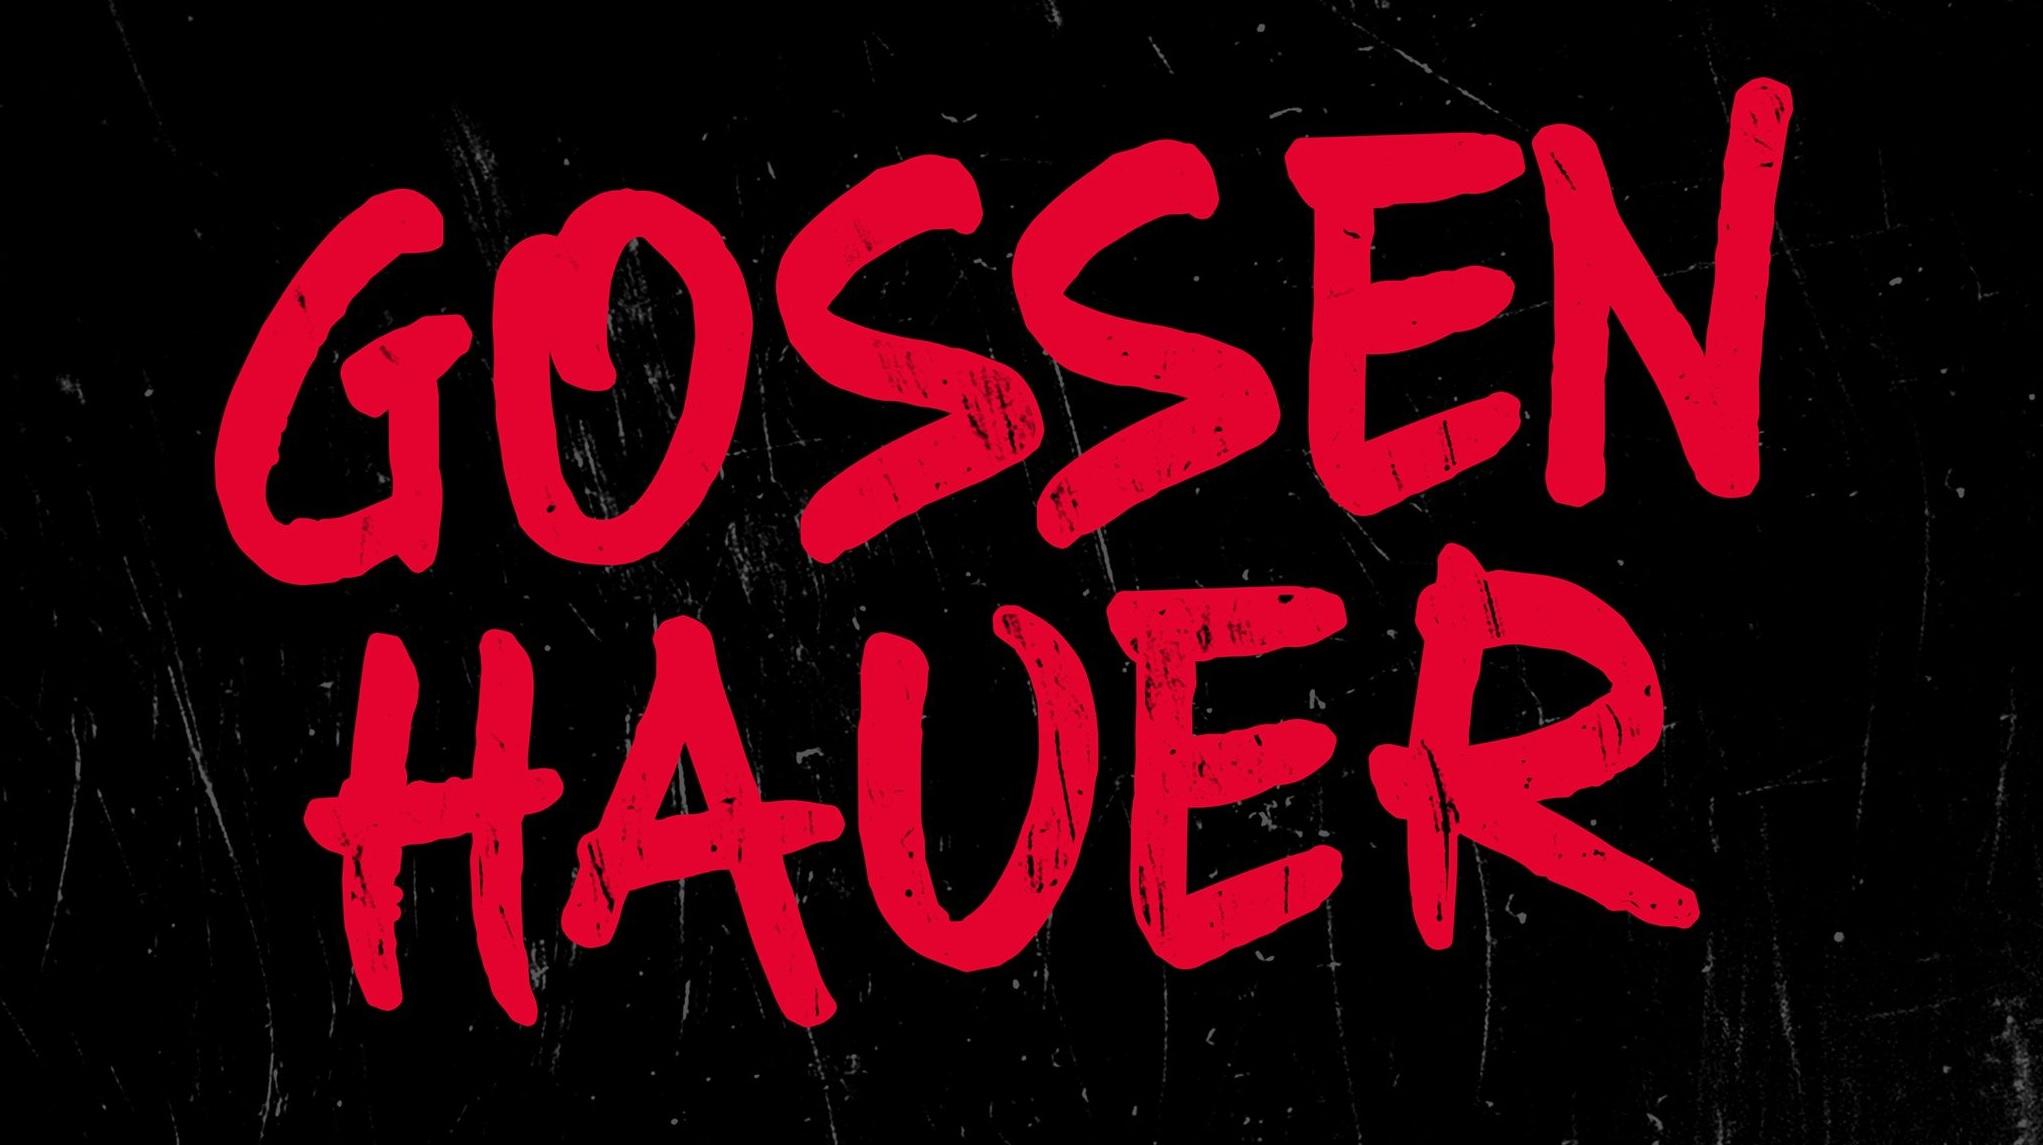 Radio Havanna Gossenhauer